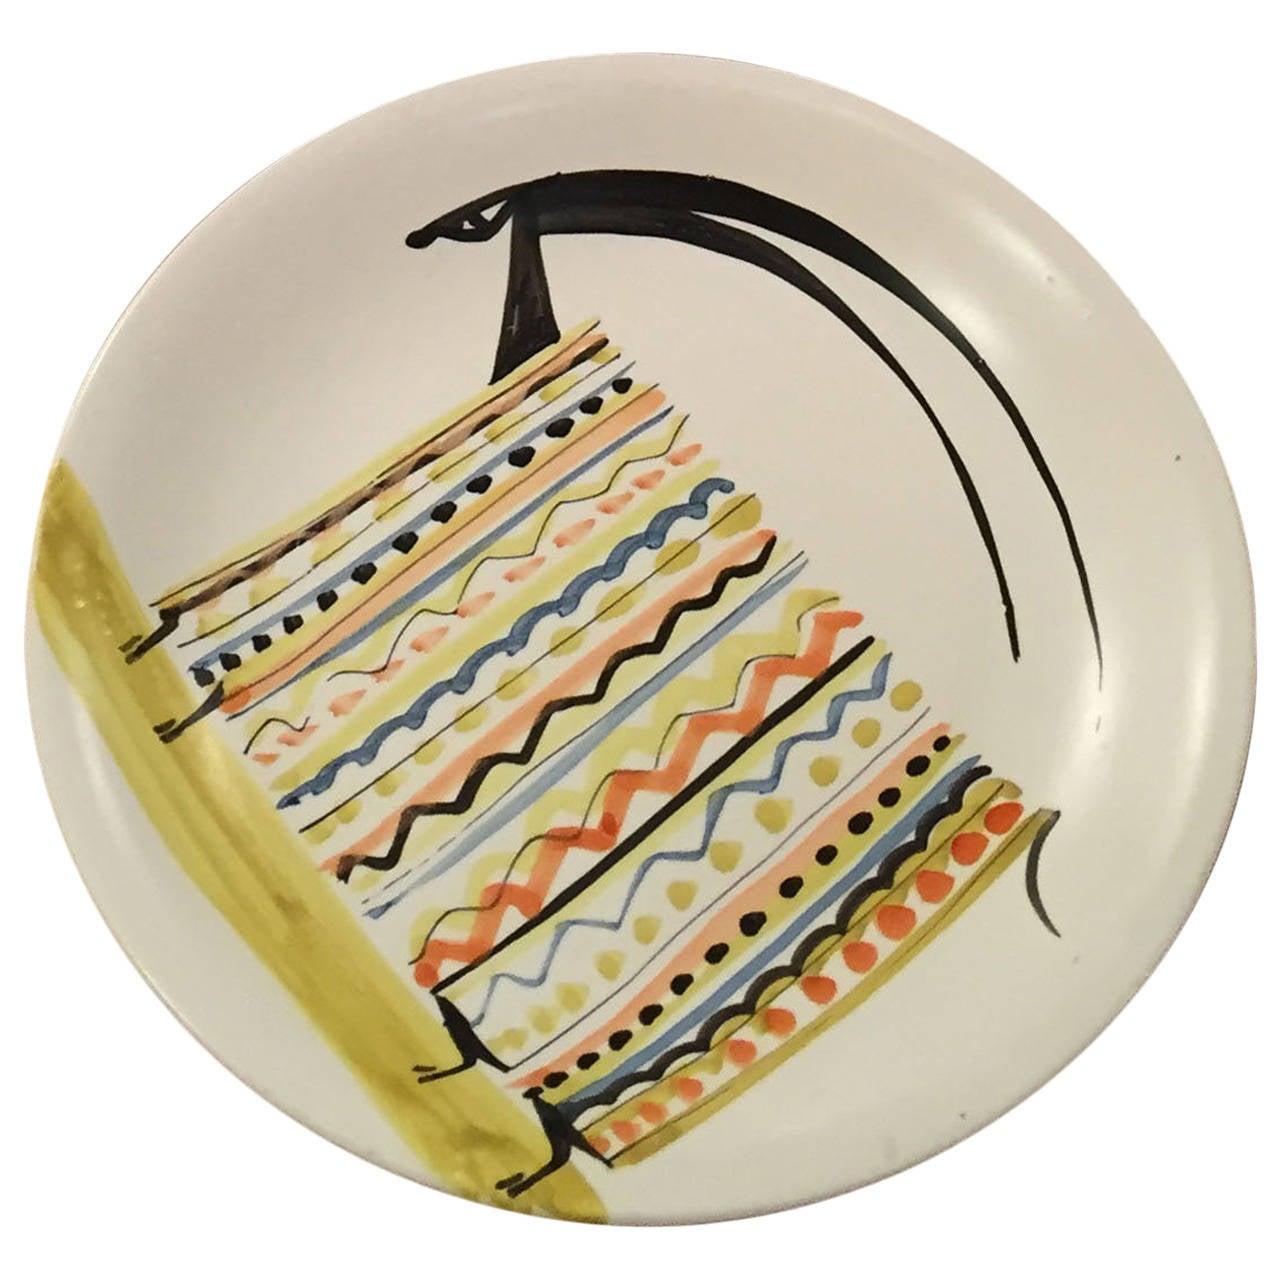 Decorative Ceramic Plate by Roger Capron 1